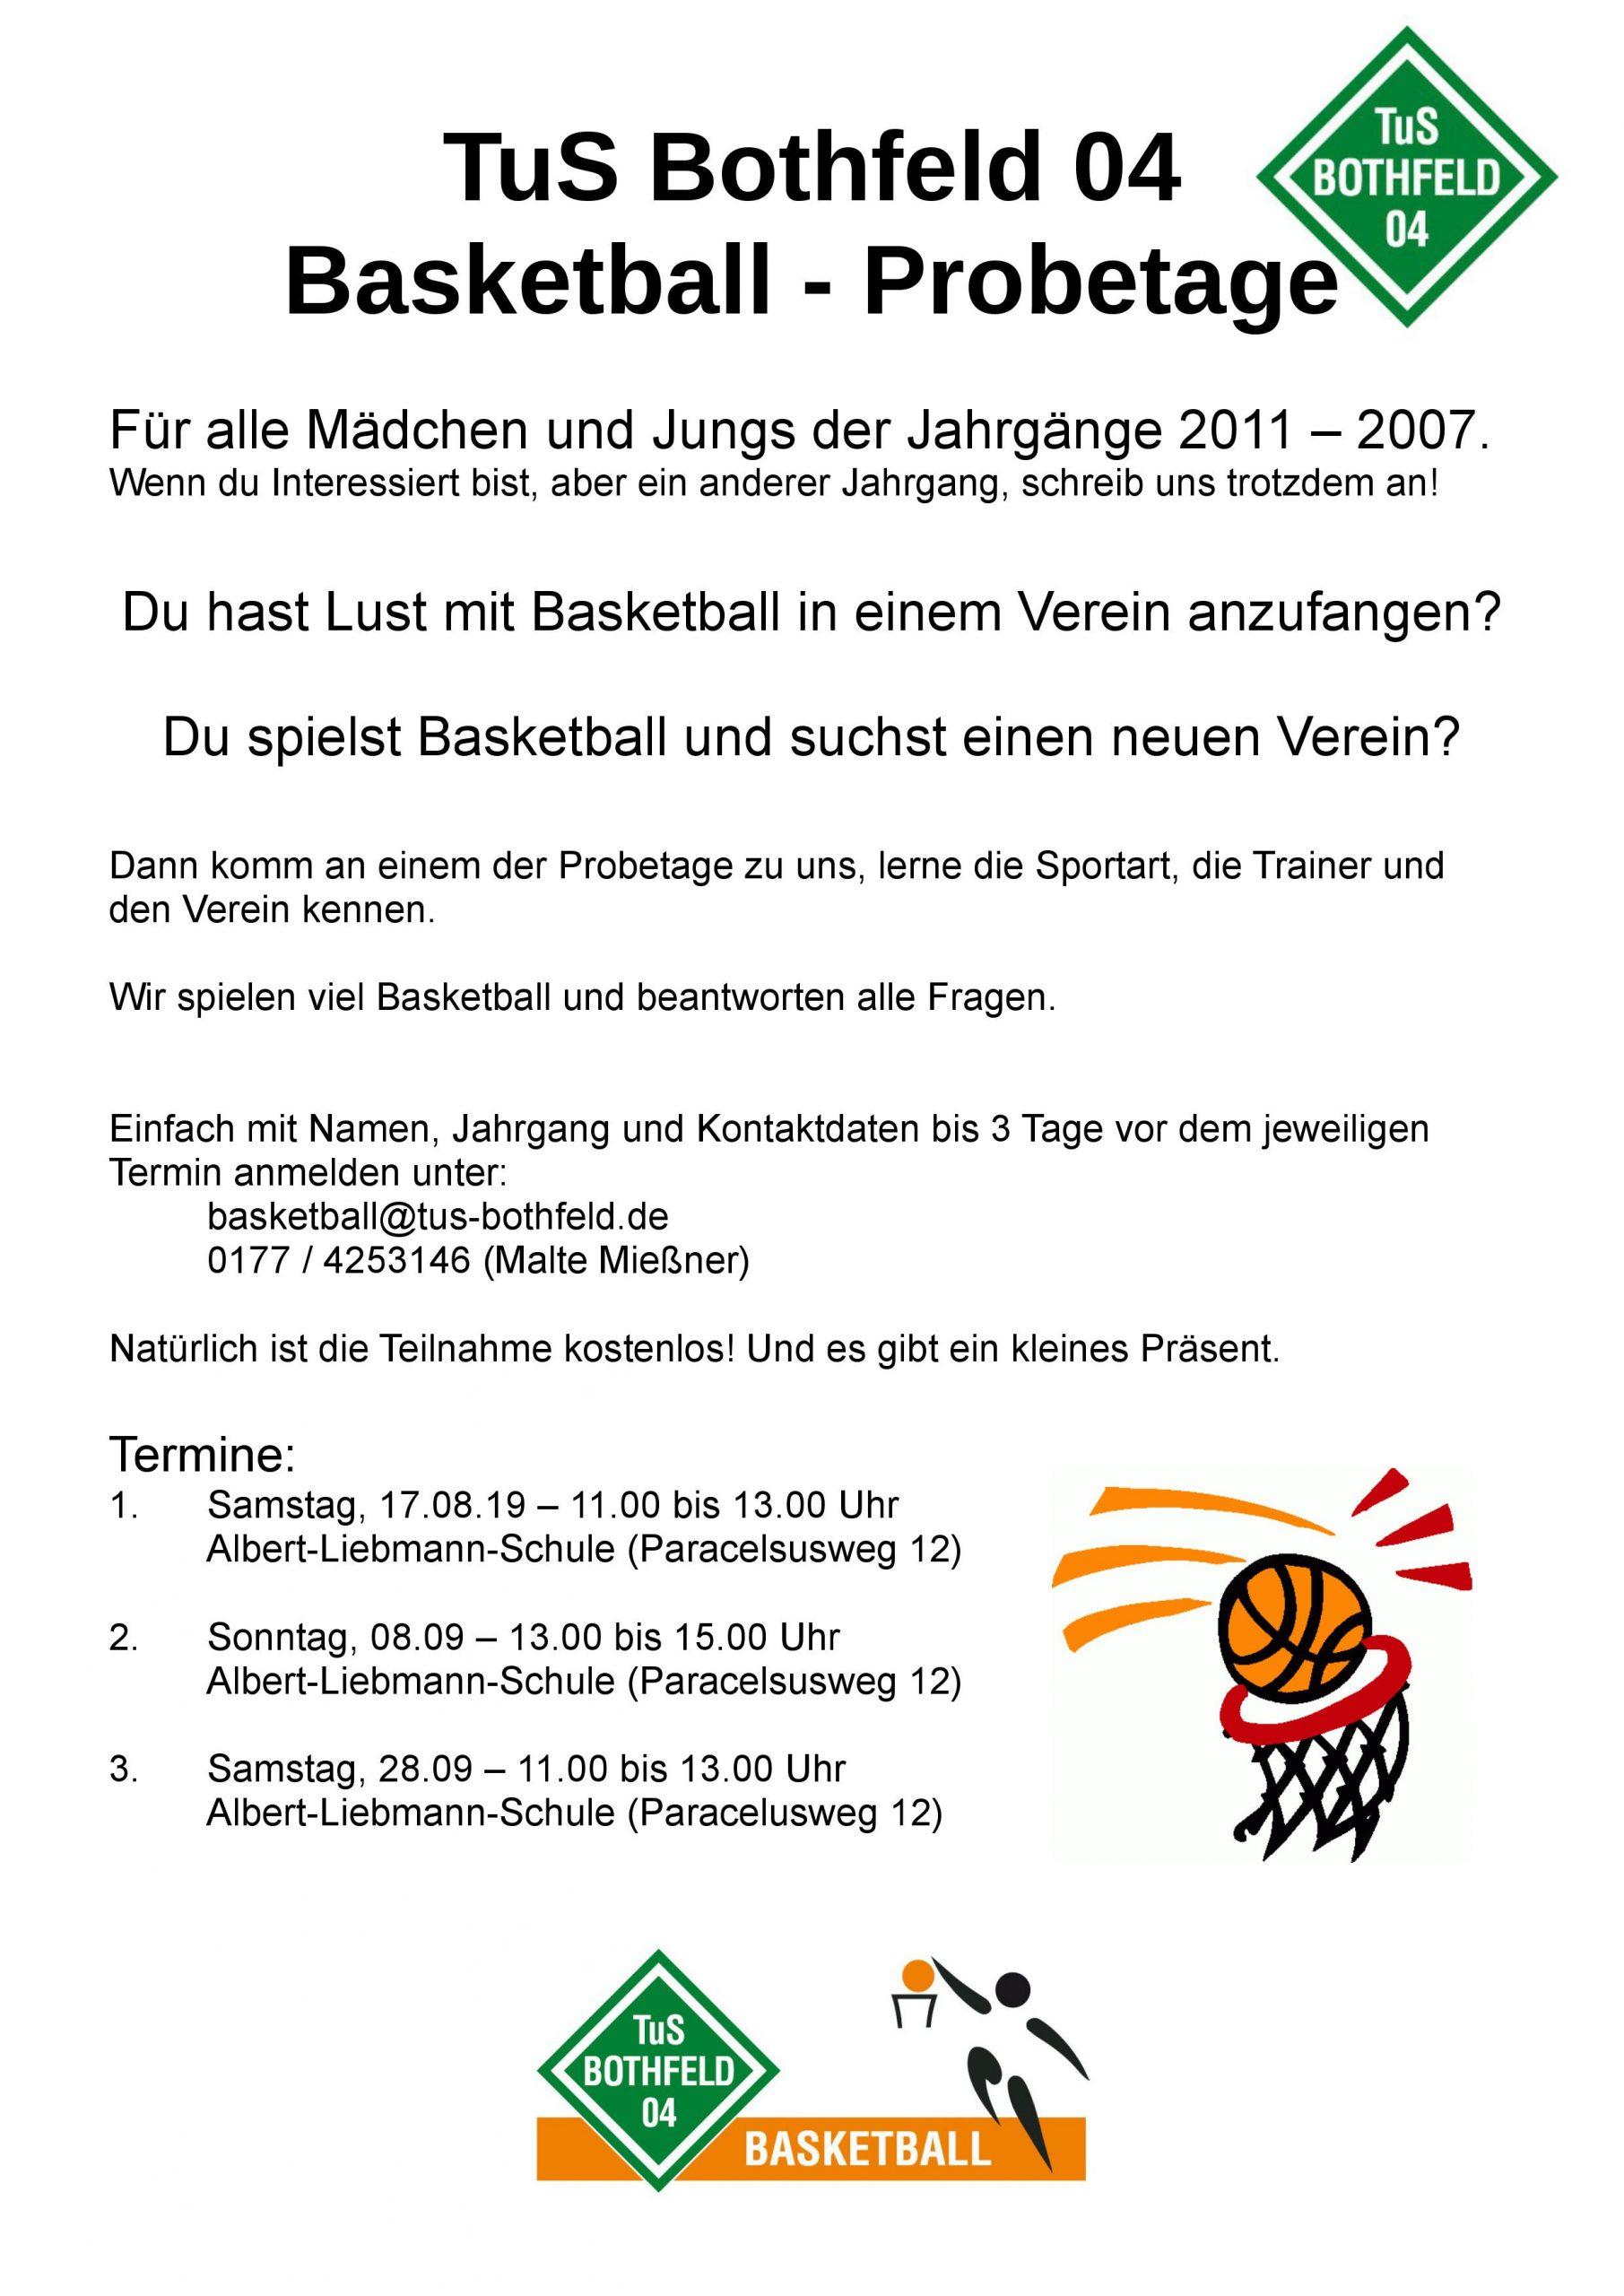 Basketball Probetage